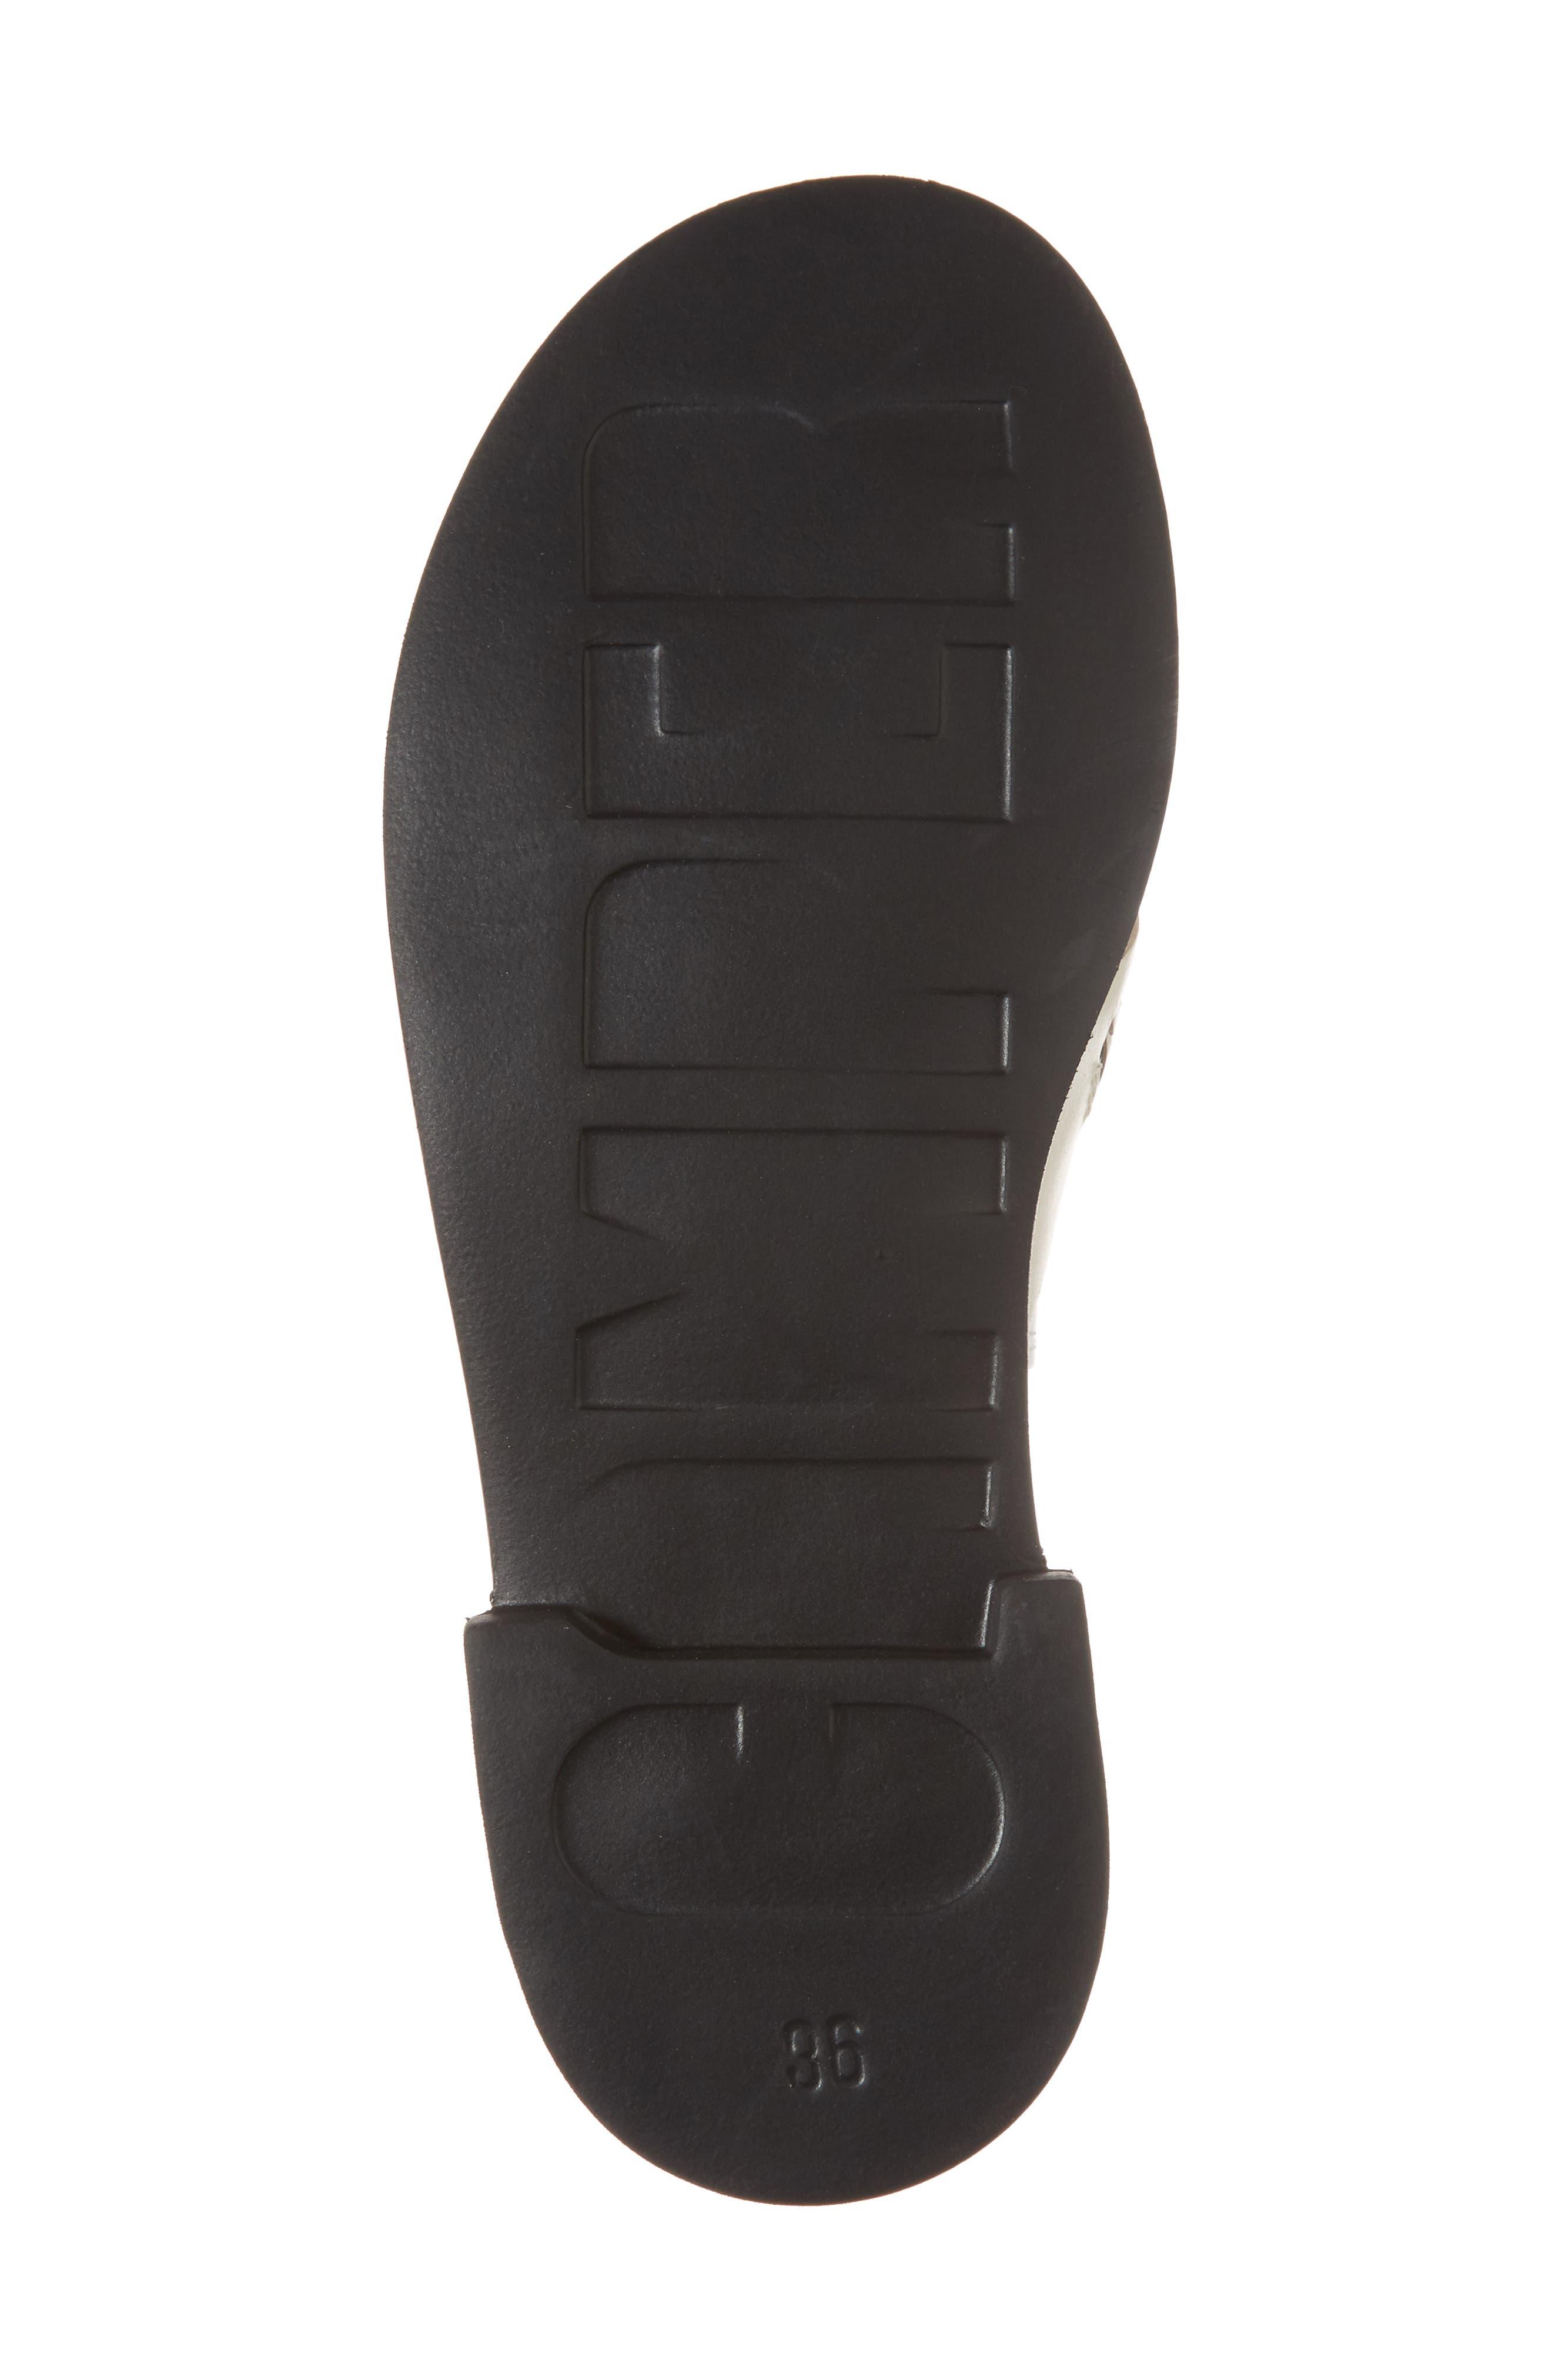 Twins Slingback Sandal,                             Alternate thumbnail 10, color,                             Multi - Assorted Leather